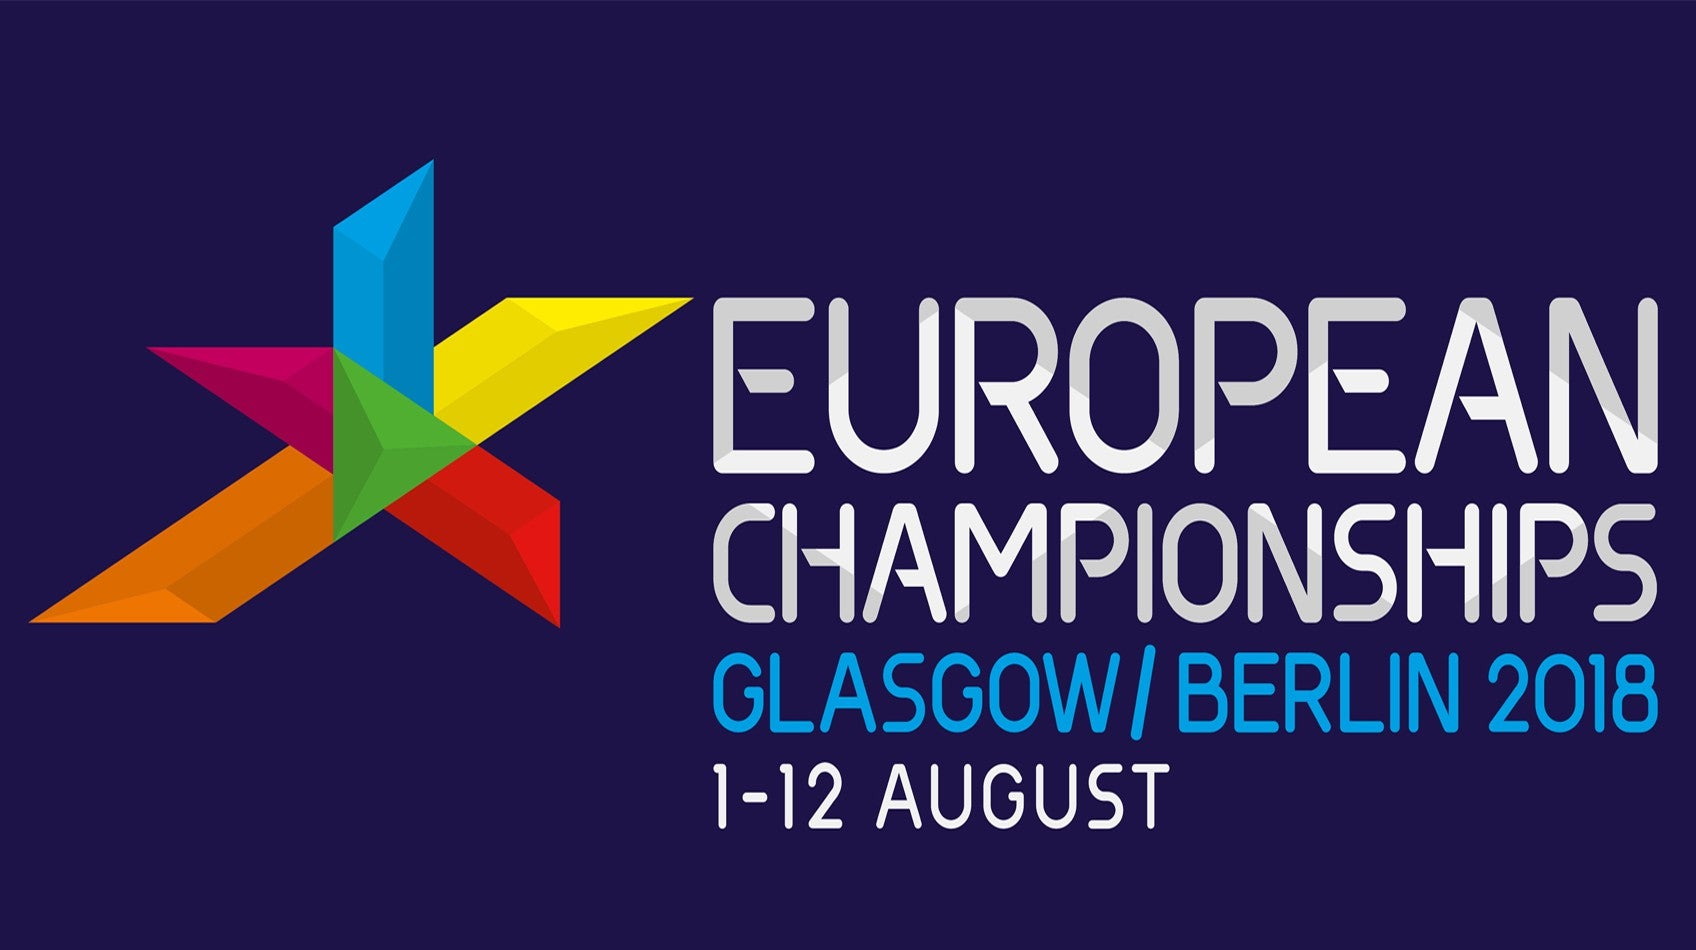 Campeonatos Europeus Glasgow/Berlim 2018 - (Resumo do Dia)